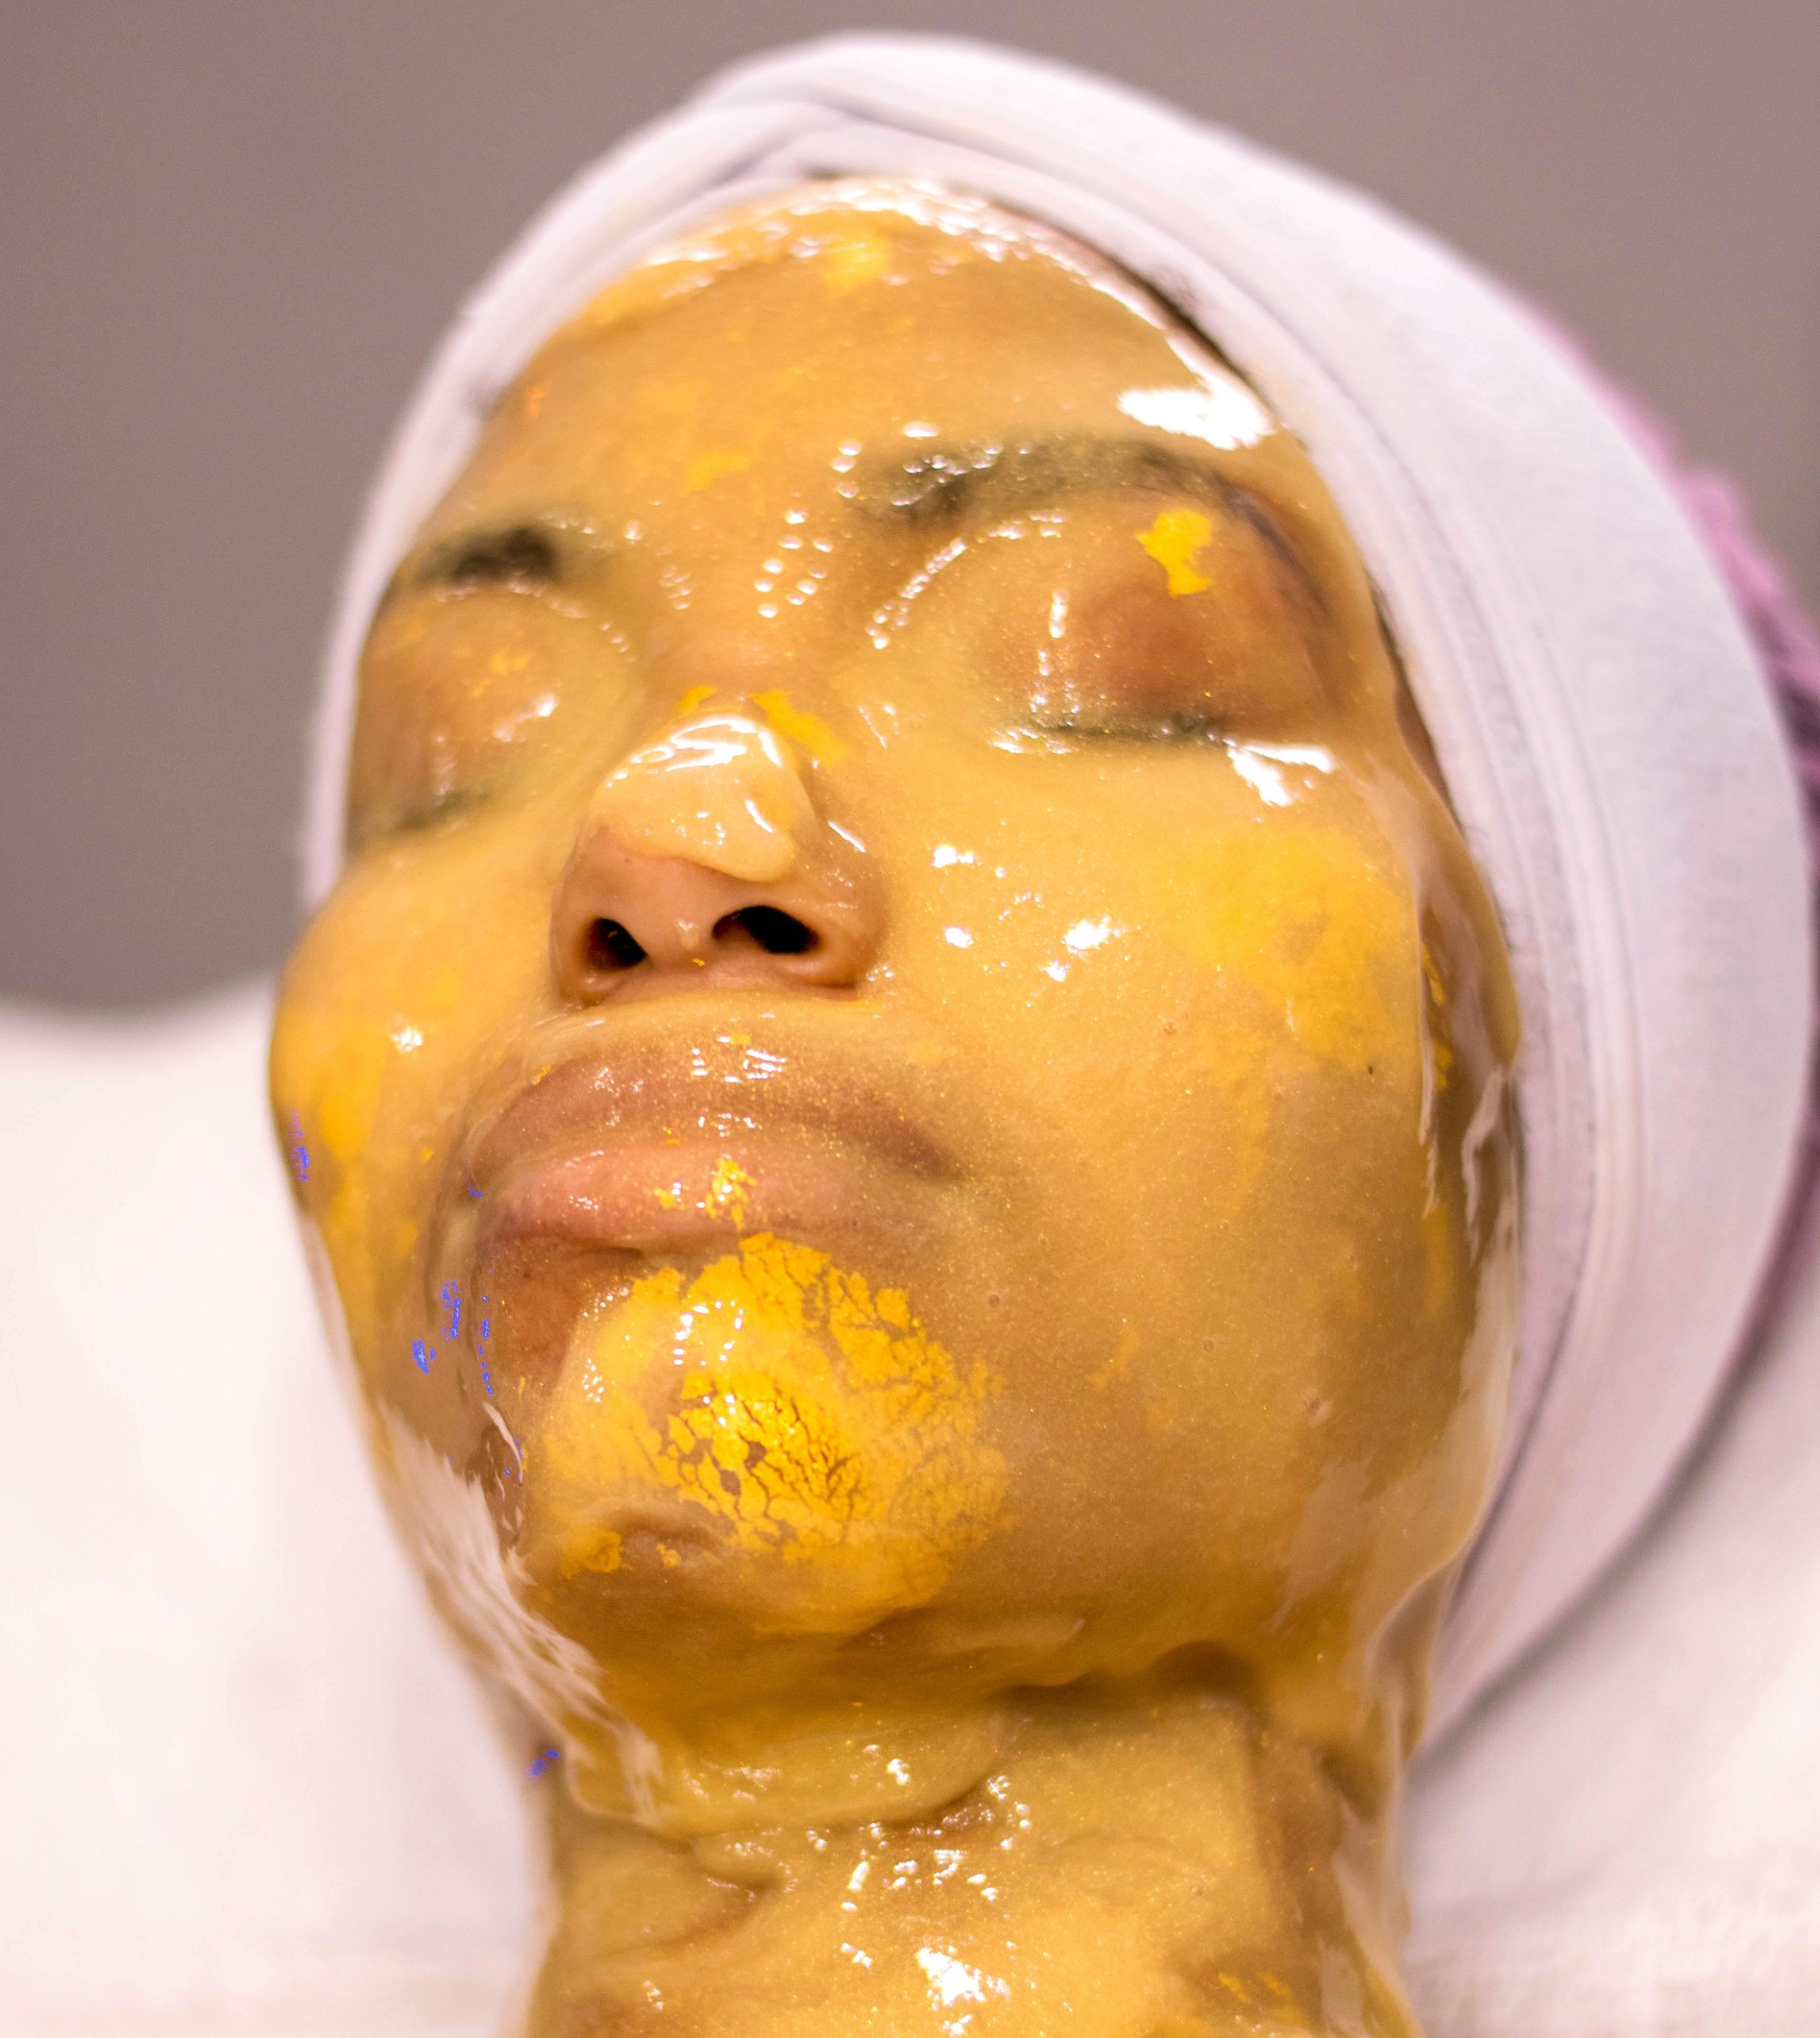 24K Gold Facial